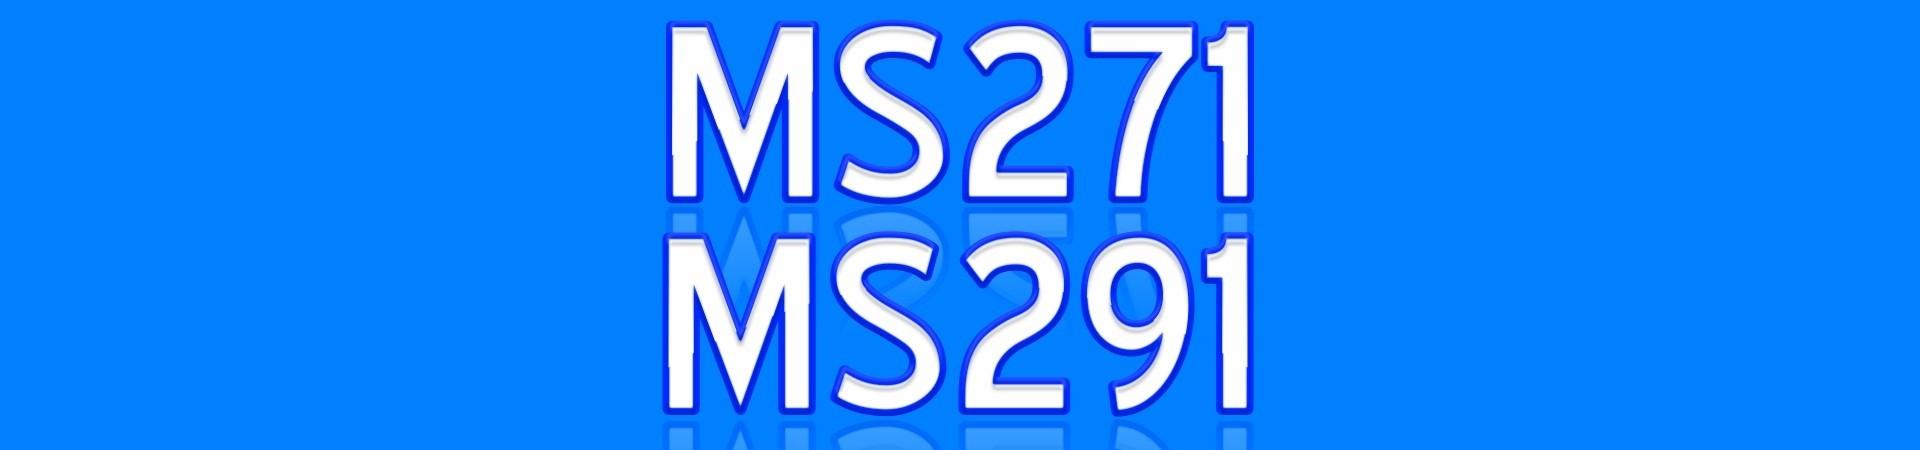 REPUESTOS para Motosierra STIHL MS271 MS291